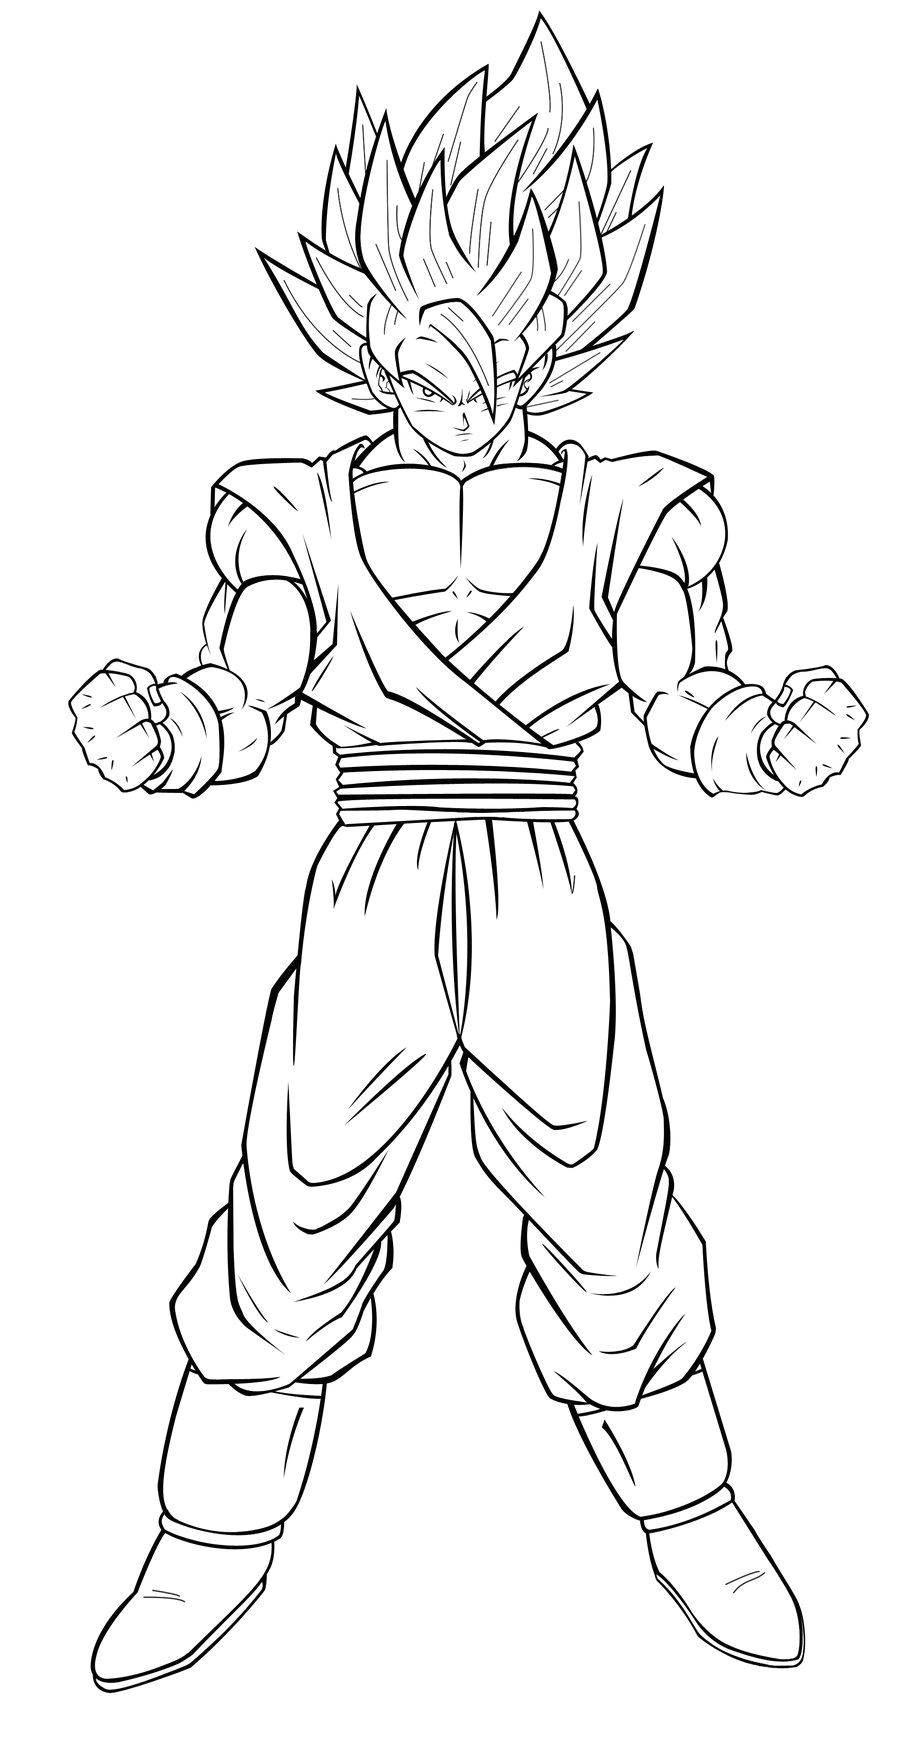 goku super saiyan 4 goku super saiyan 4 drawing at getdrawingscom free for goku super saiyan 4